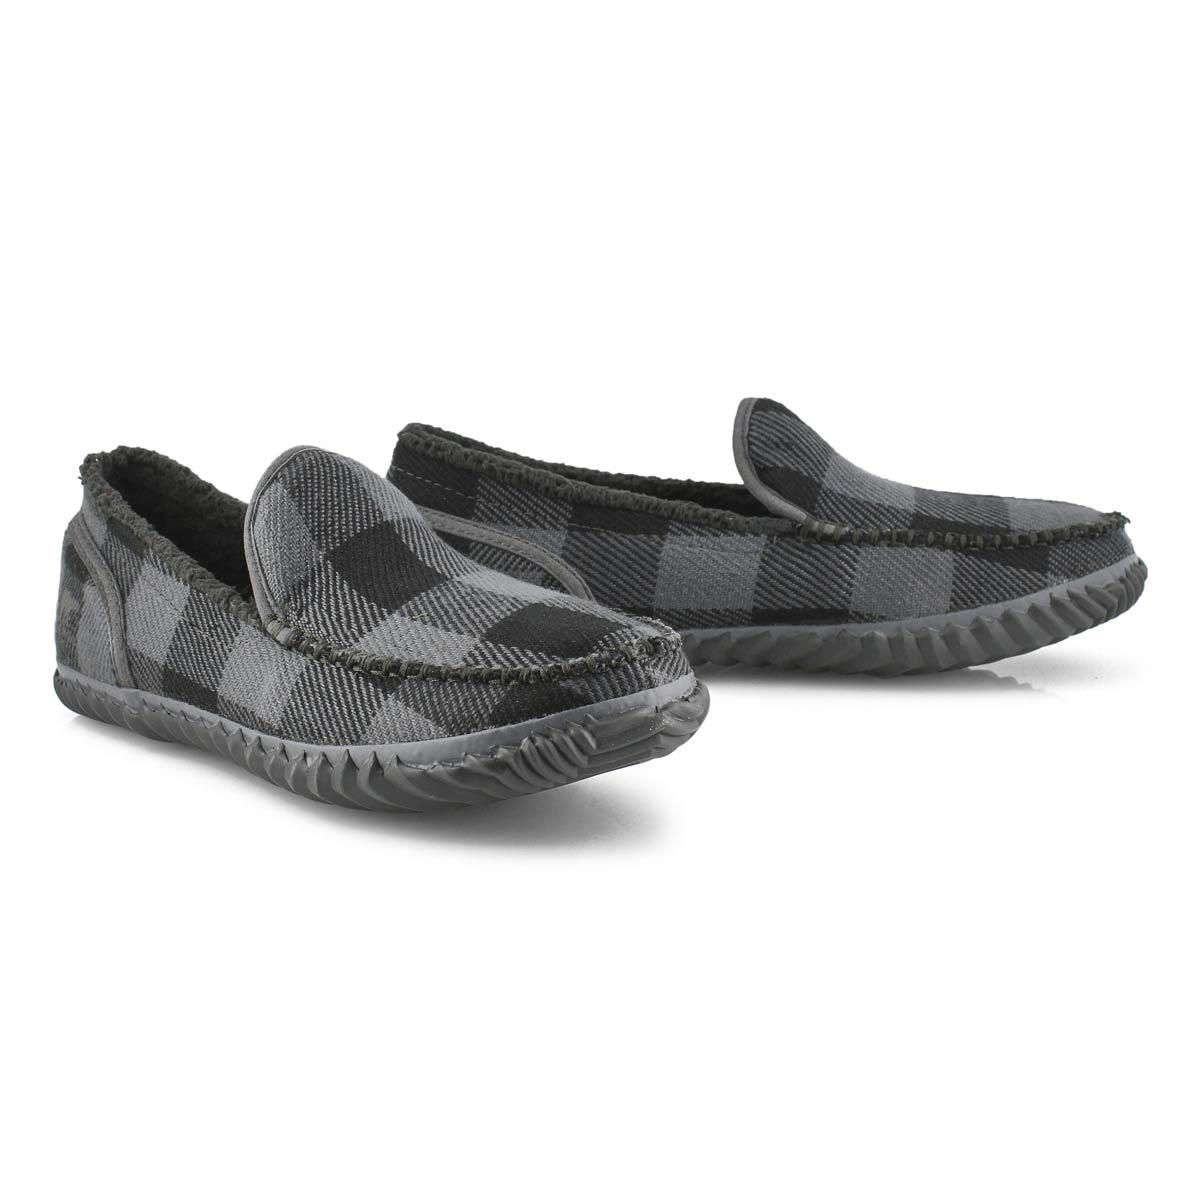 Men's Dude Moc Slipper - Grey